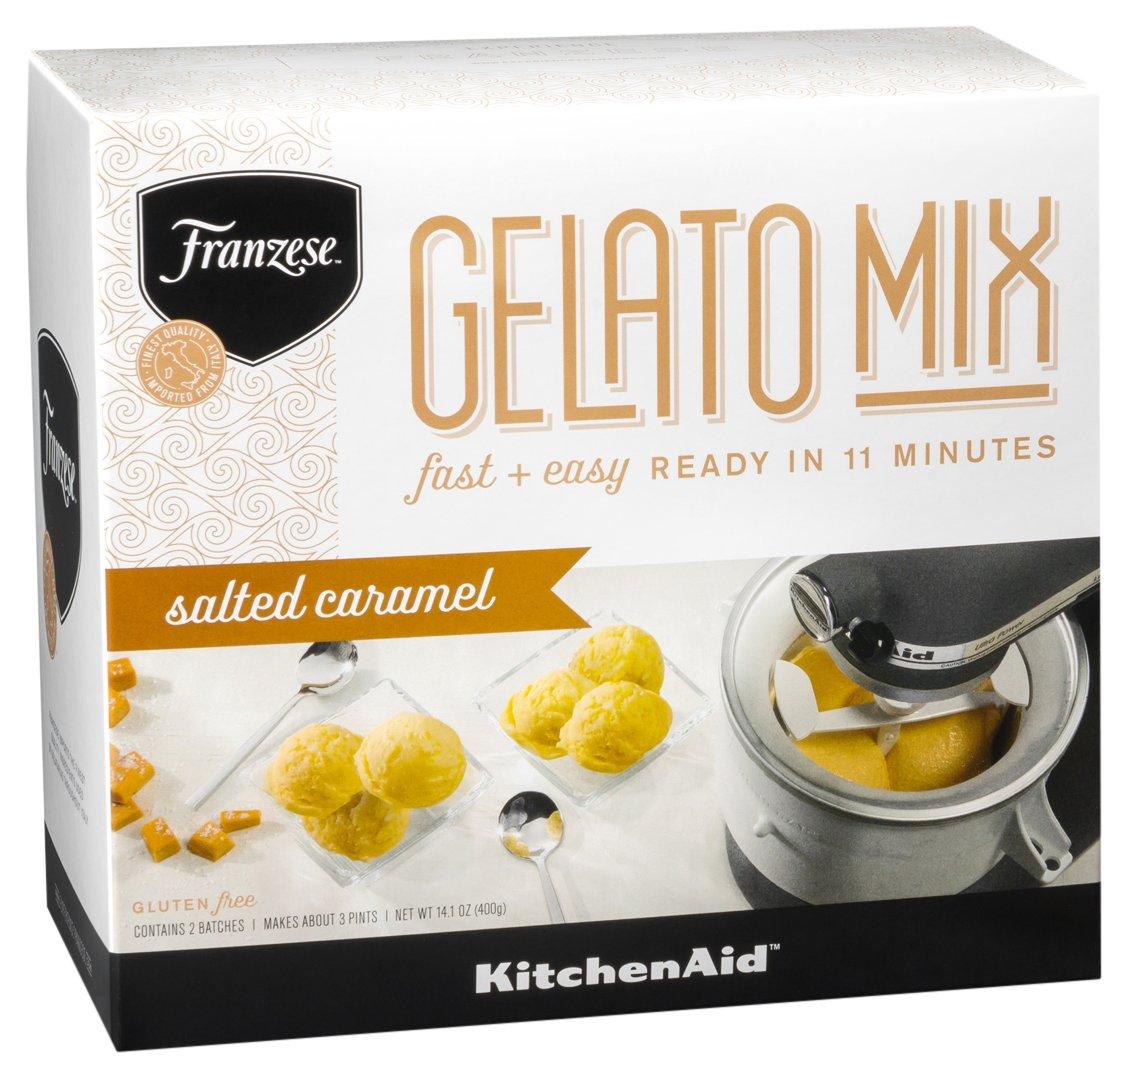 KitchenAid KFMGD14TPSC Franzese Authentic Italian Salted Caramel Gelato Mix (2 Pack), 14.1 oz